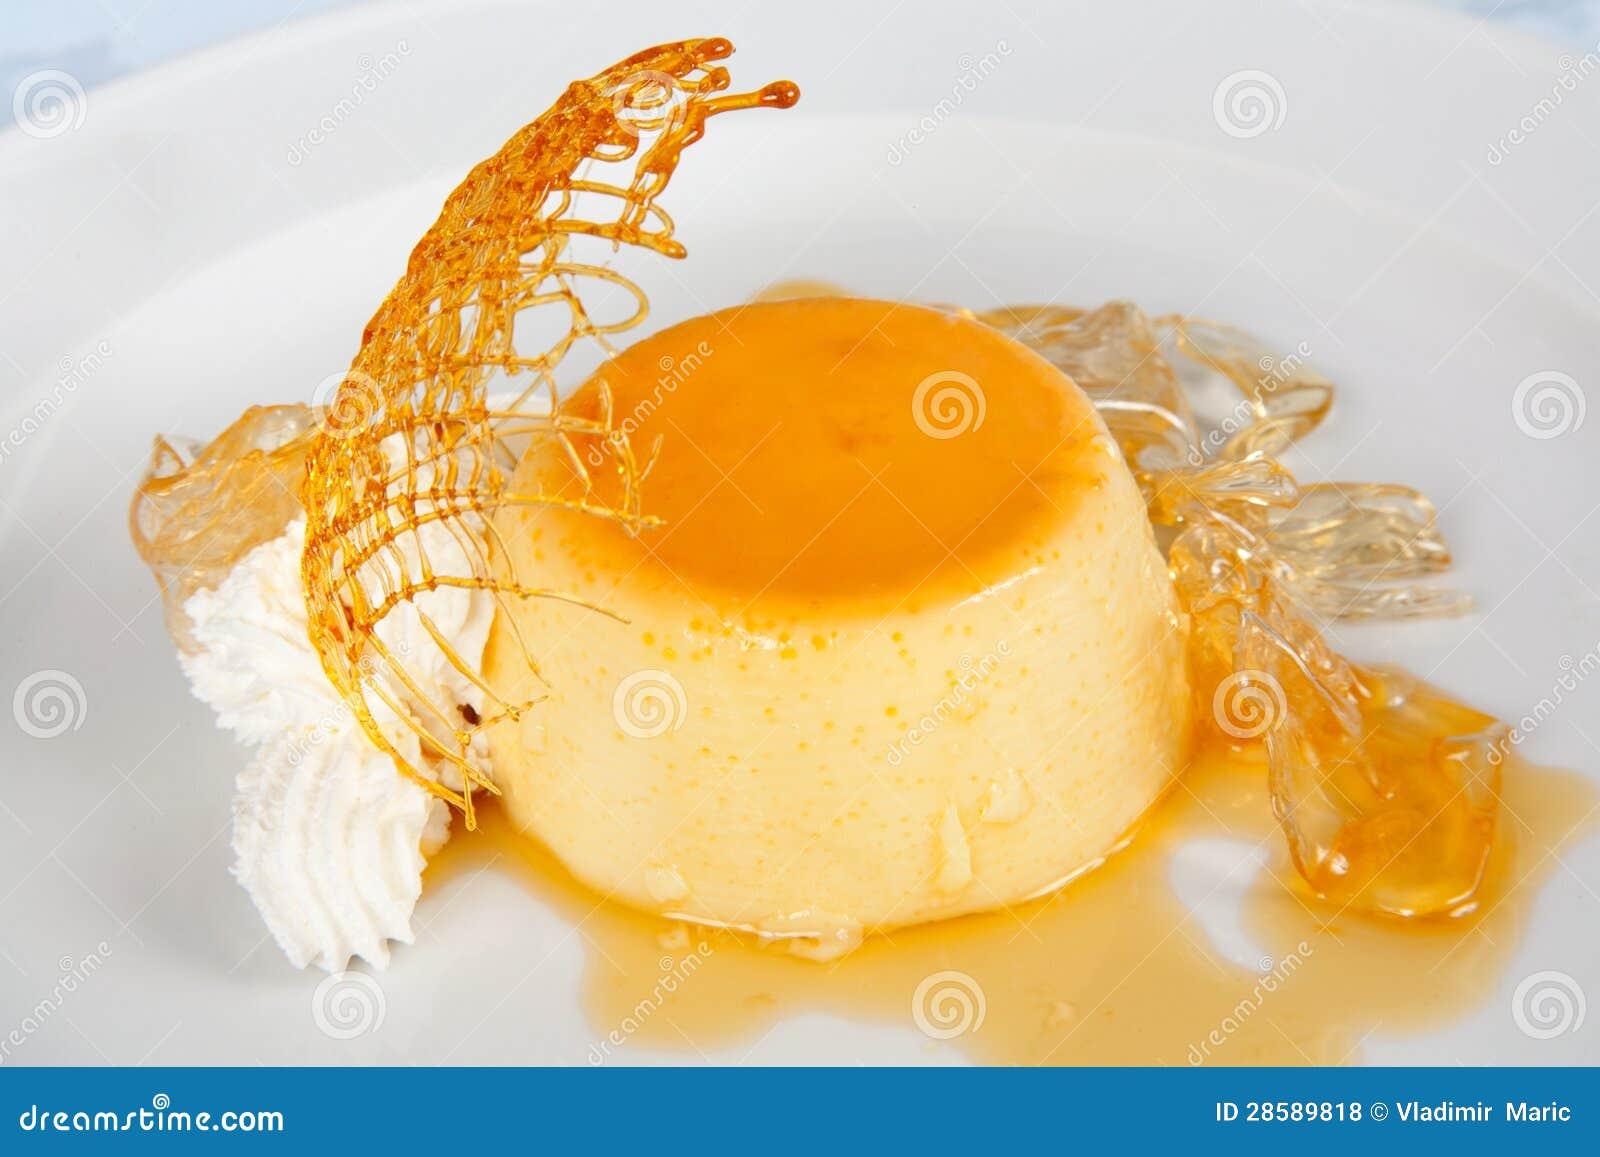 vanilla pudding whipped cream